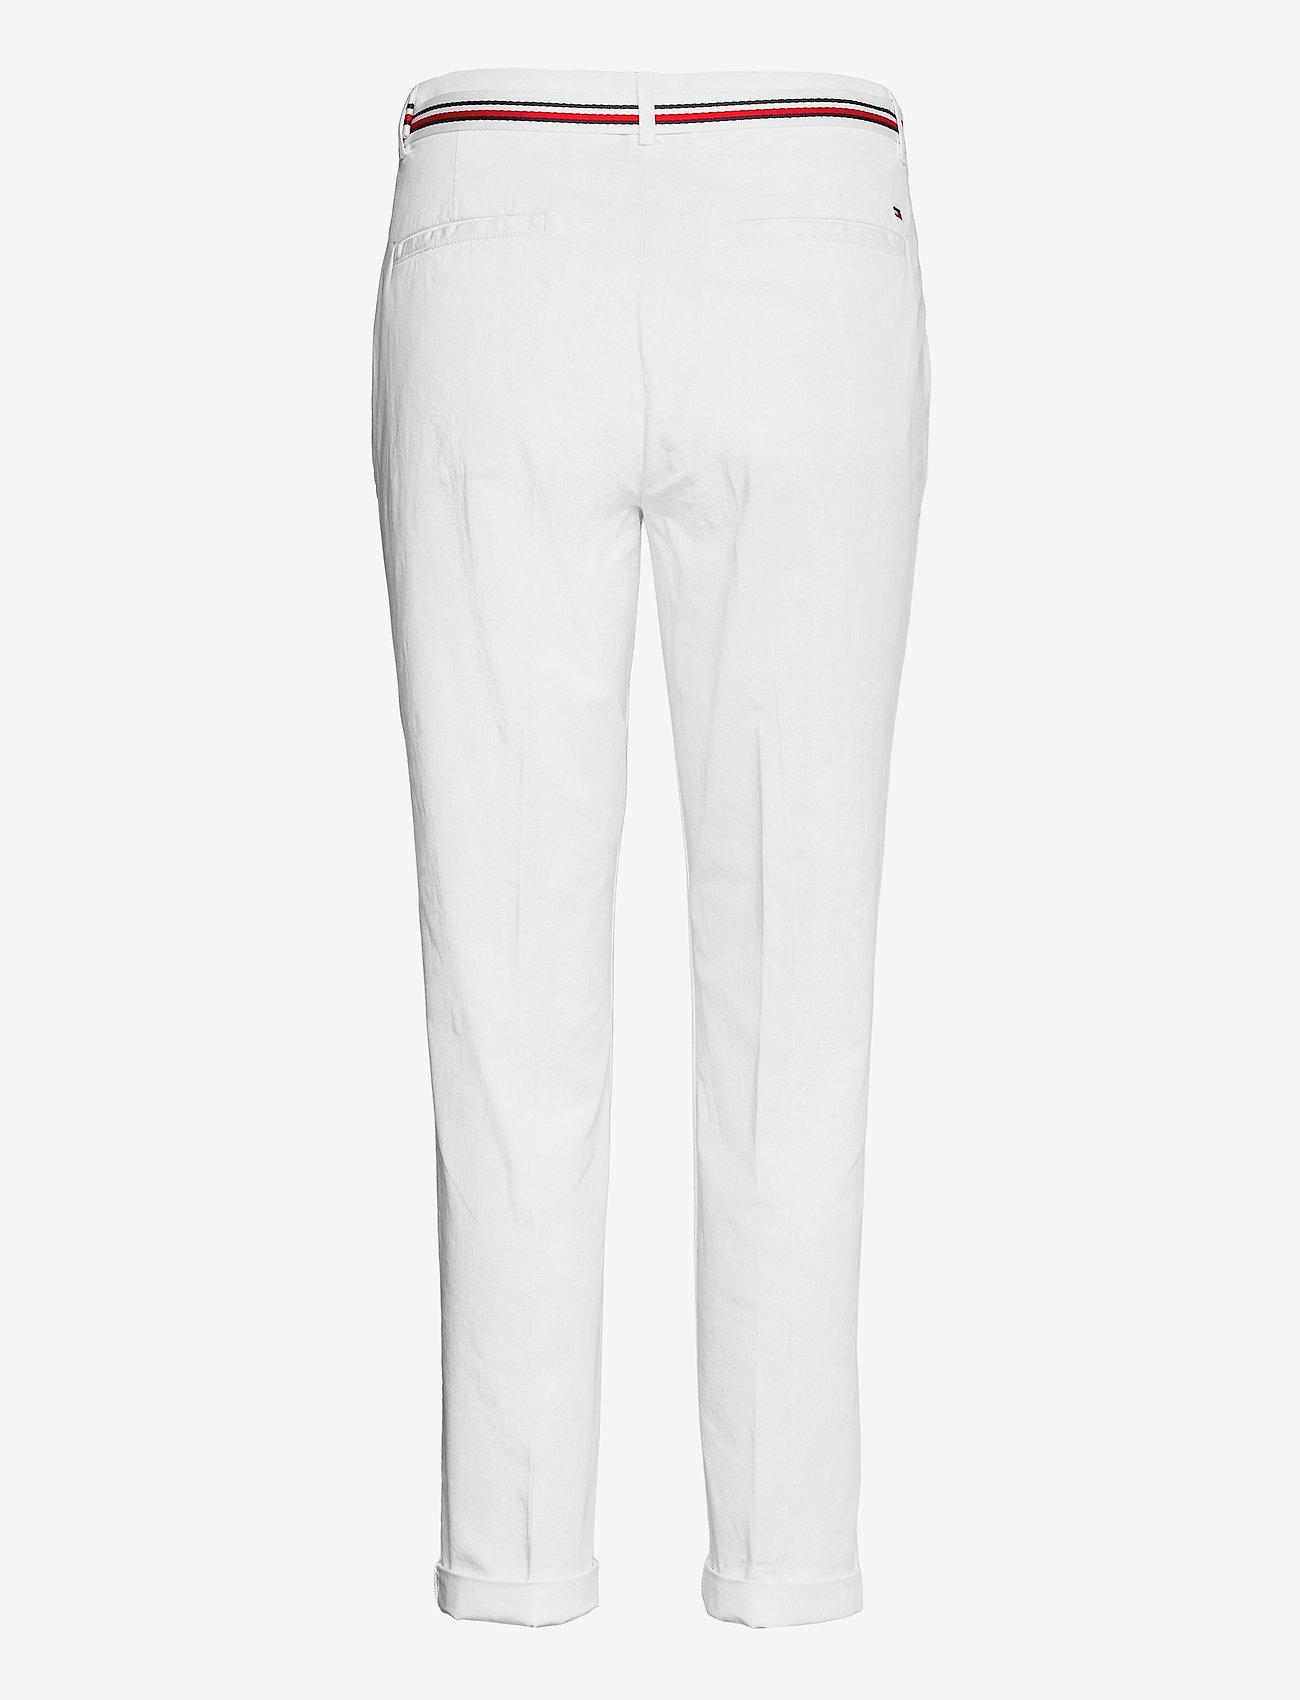 Tommy Hilfiger - CO TENCEL CHINO SLIM PANT - chinos - white - 1